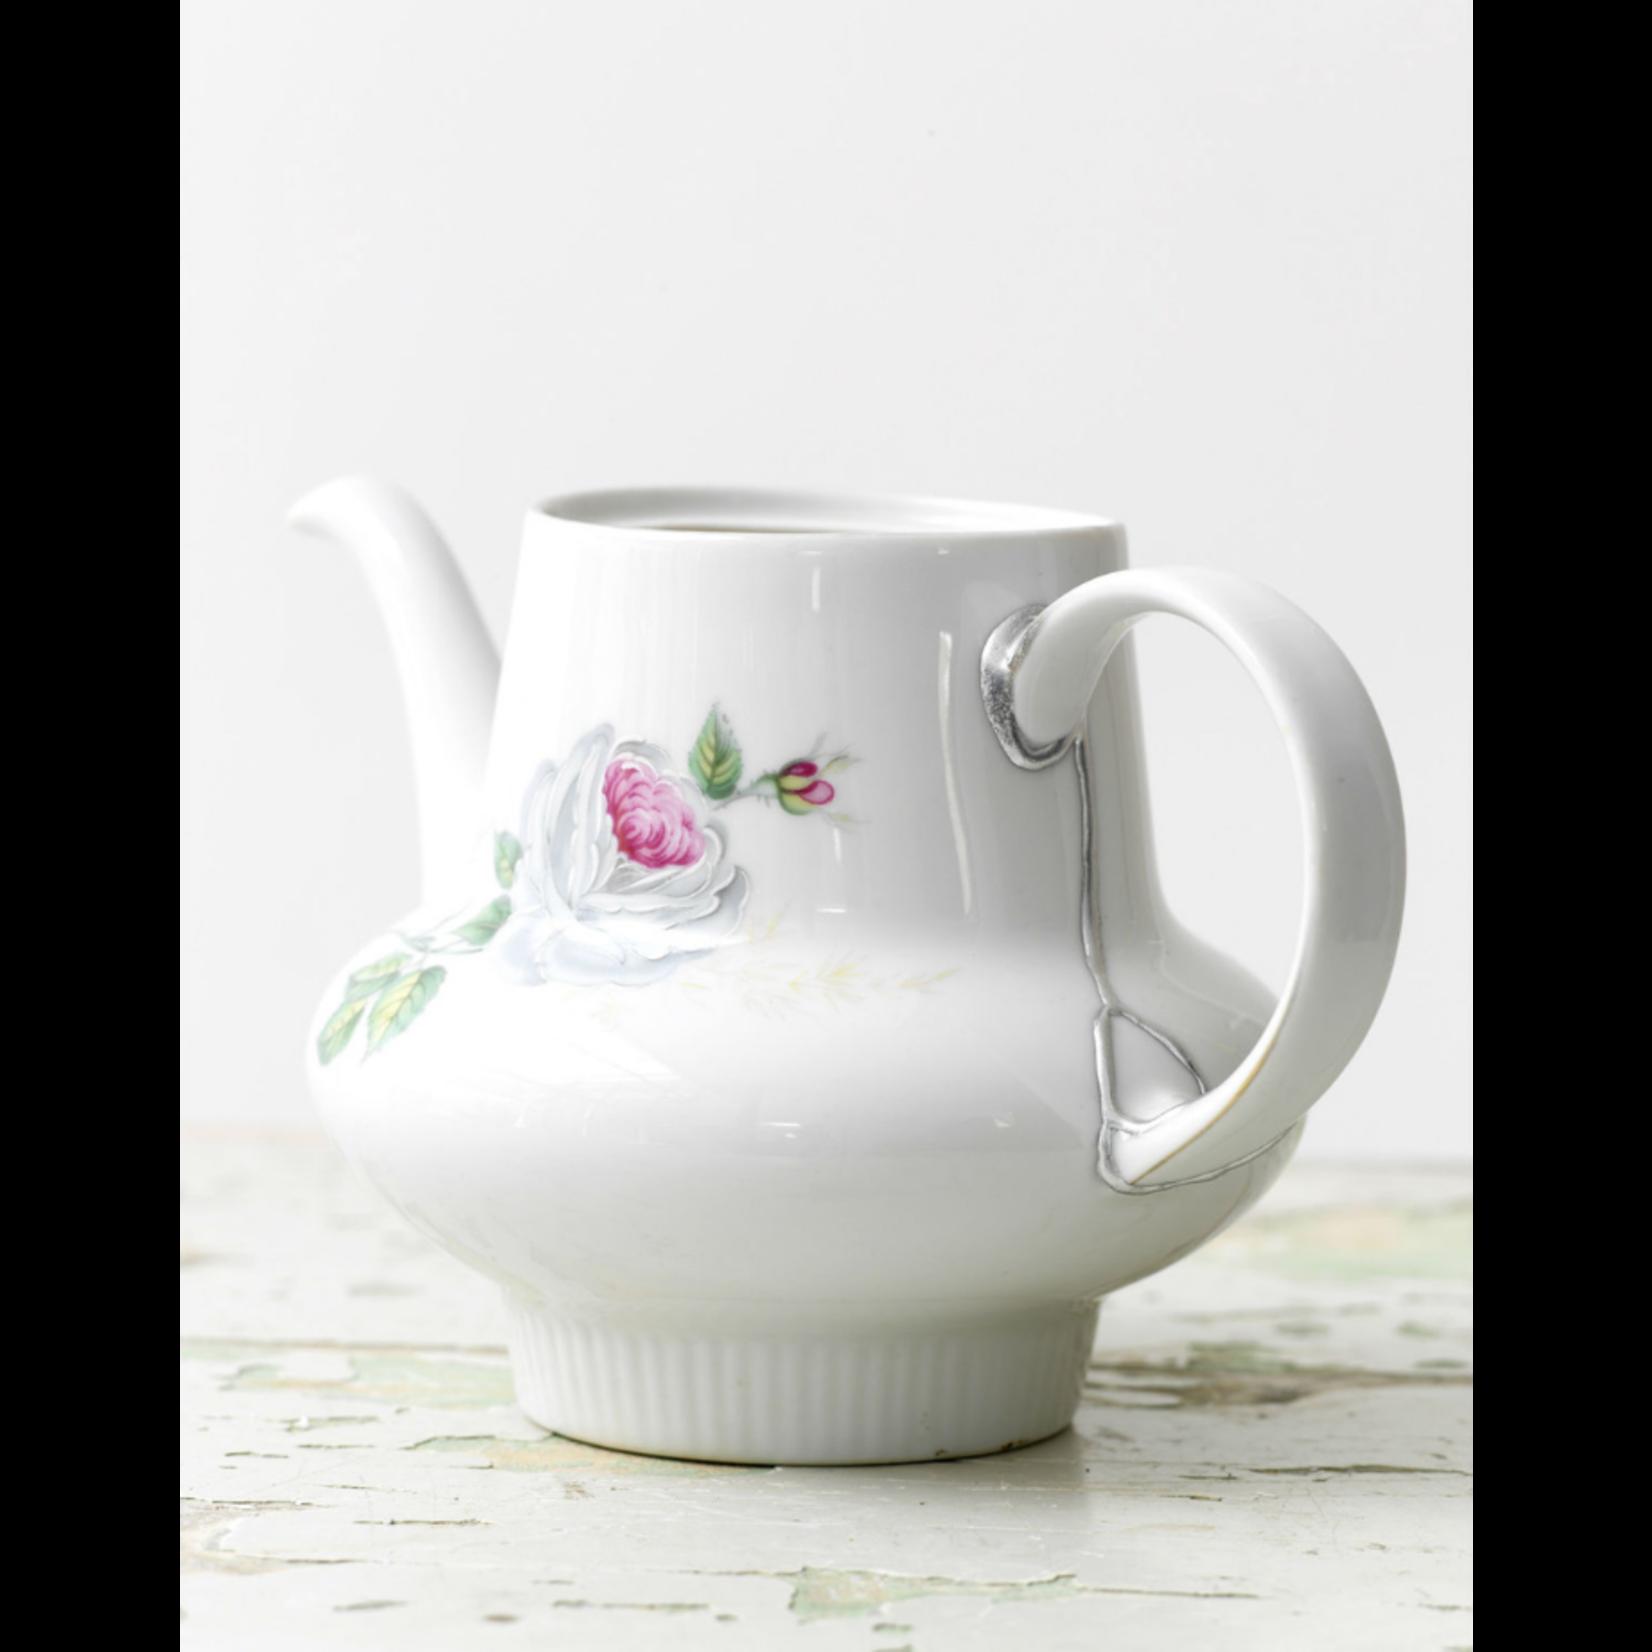 humade humade new kintsugi ceramics repair kit - silver